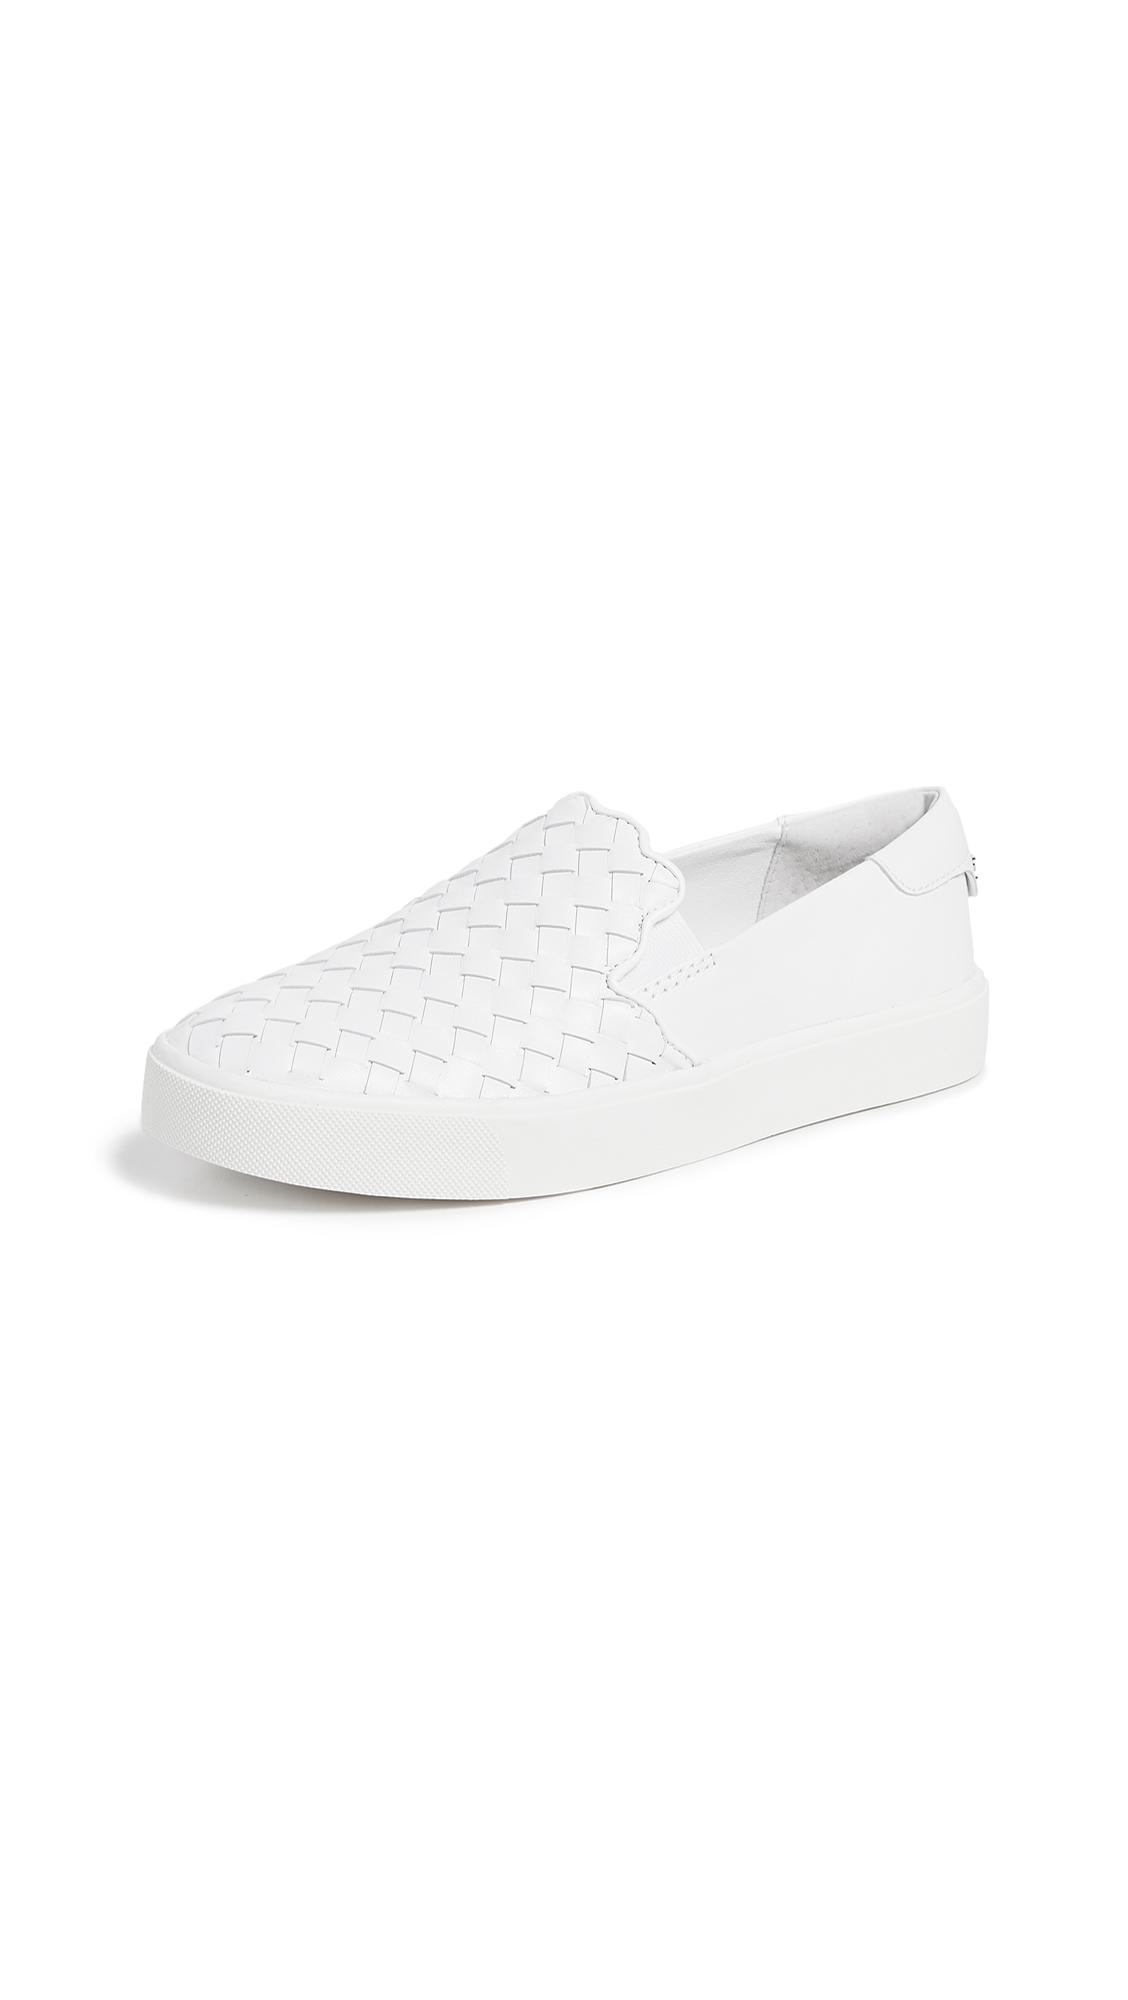 Sam Edelman Eda Slip Ons - Bright White